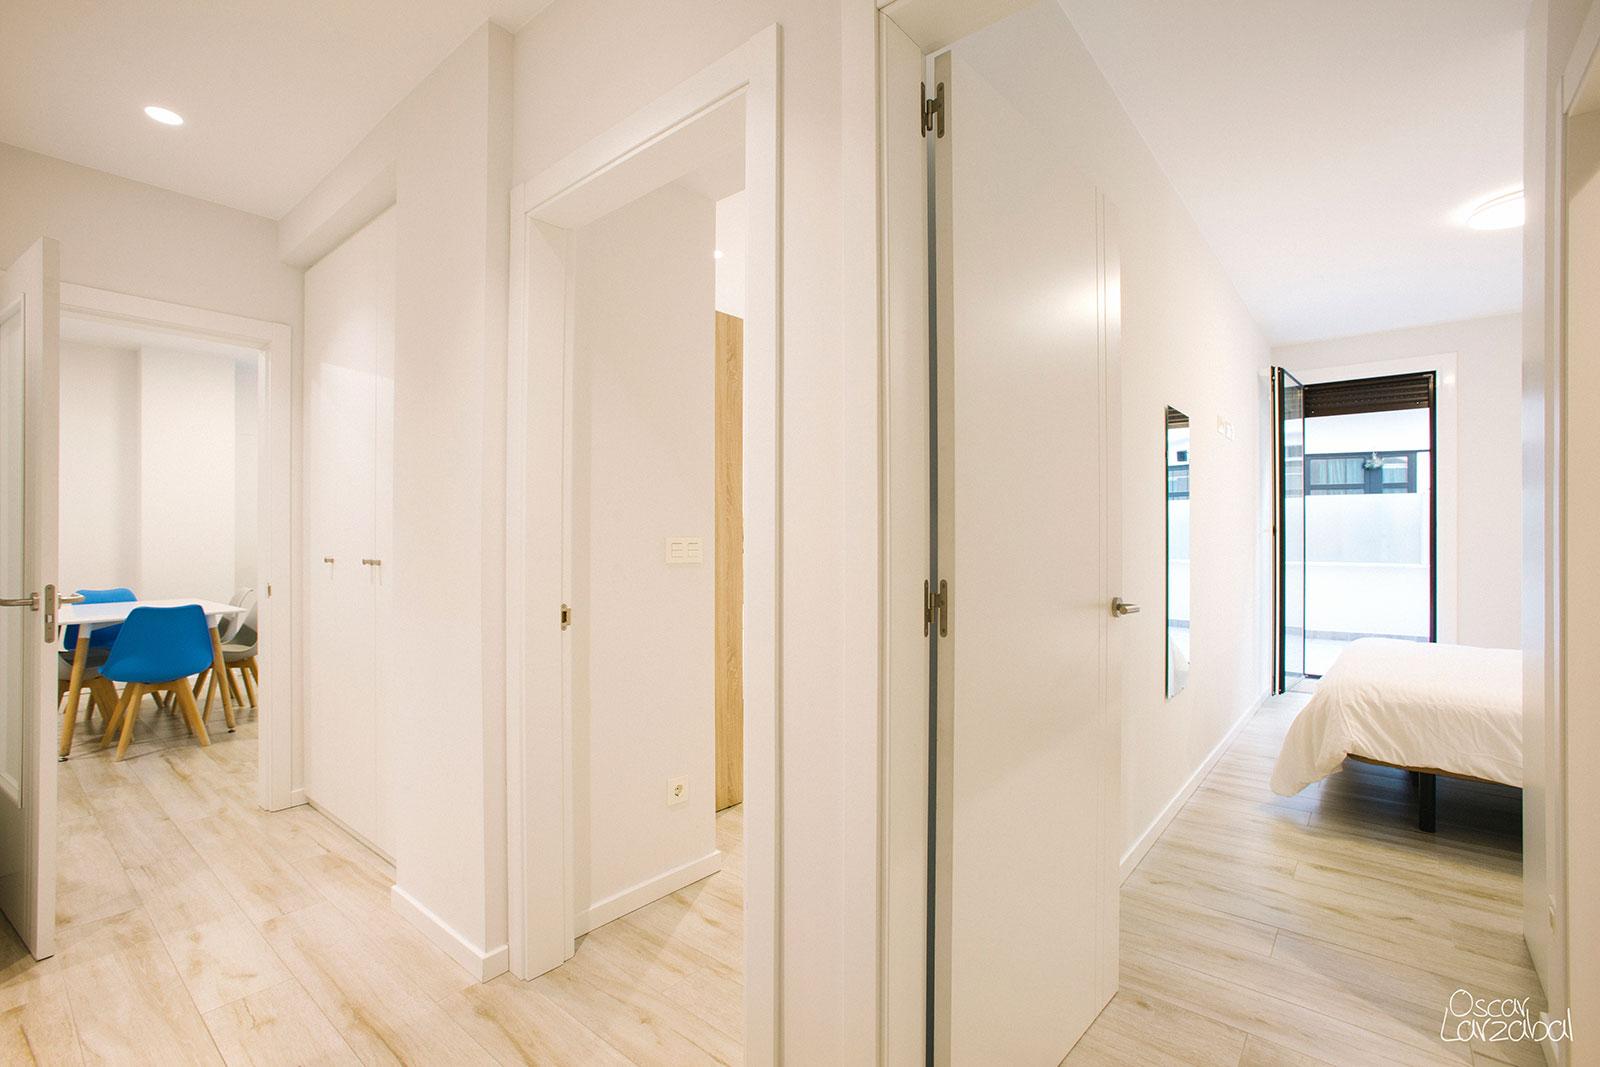 fotografo interior San Sebastian interiorismo Donostia